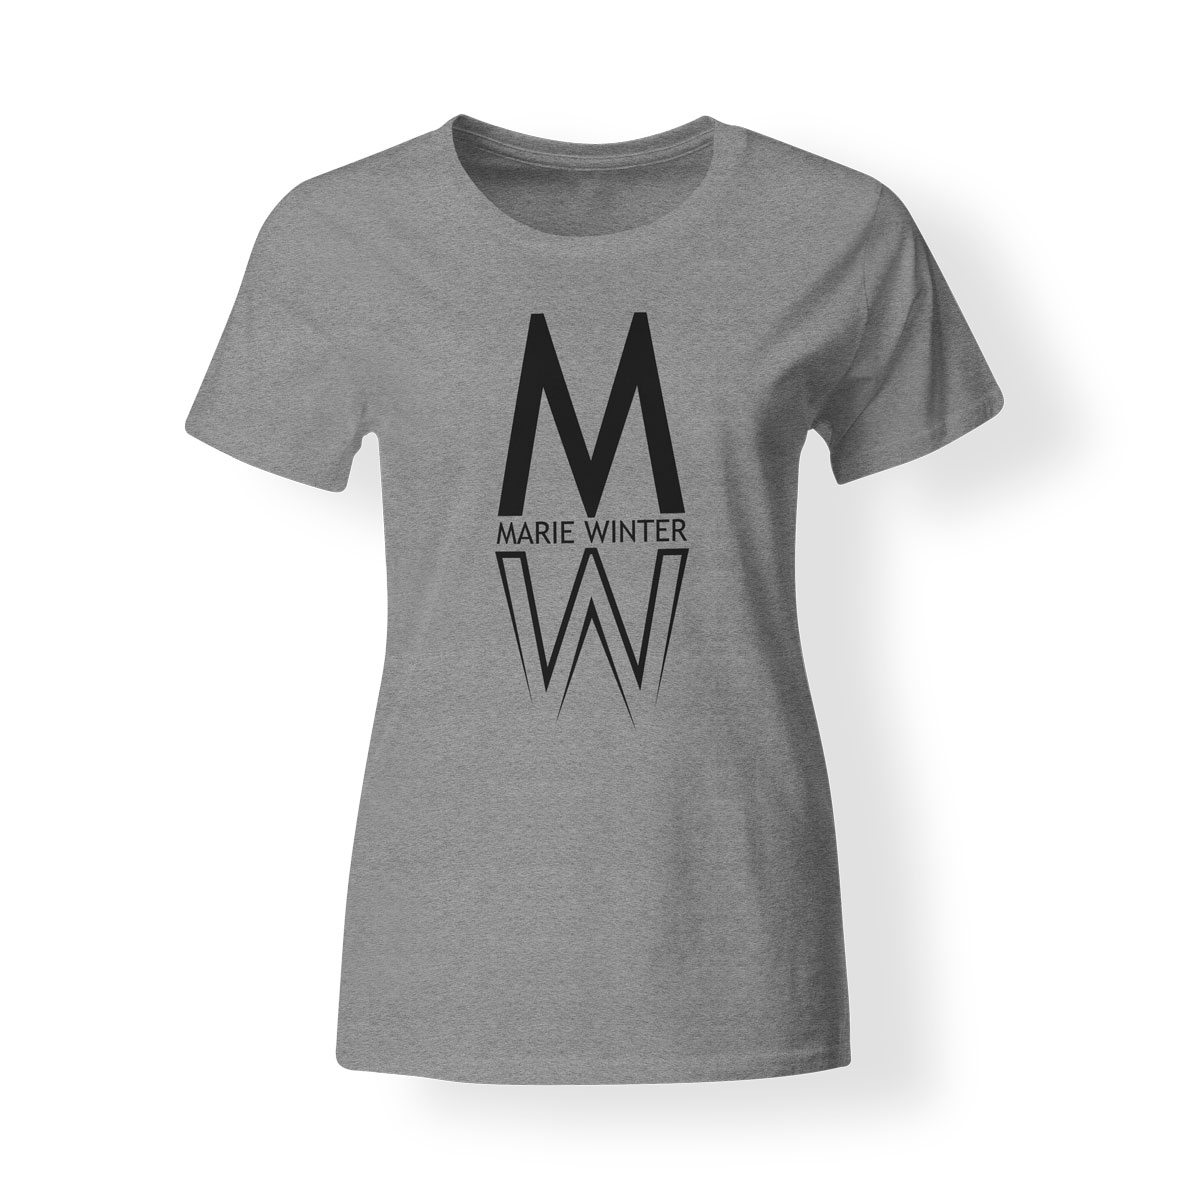 Marie Winter Damen T-Shirt grau